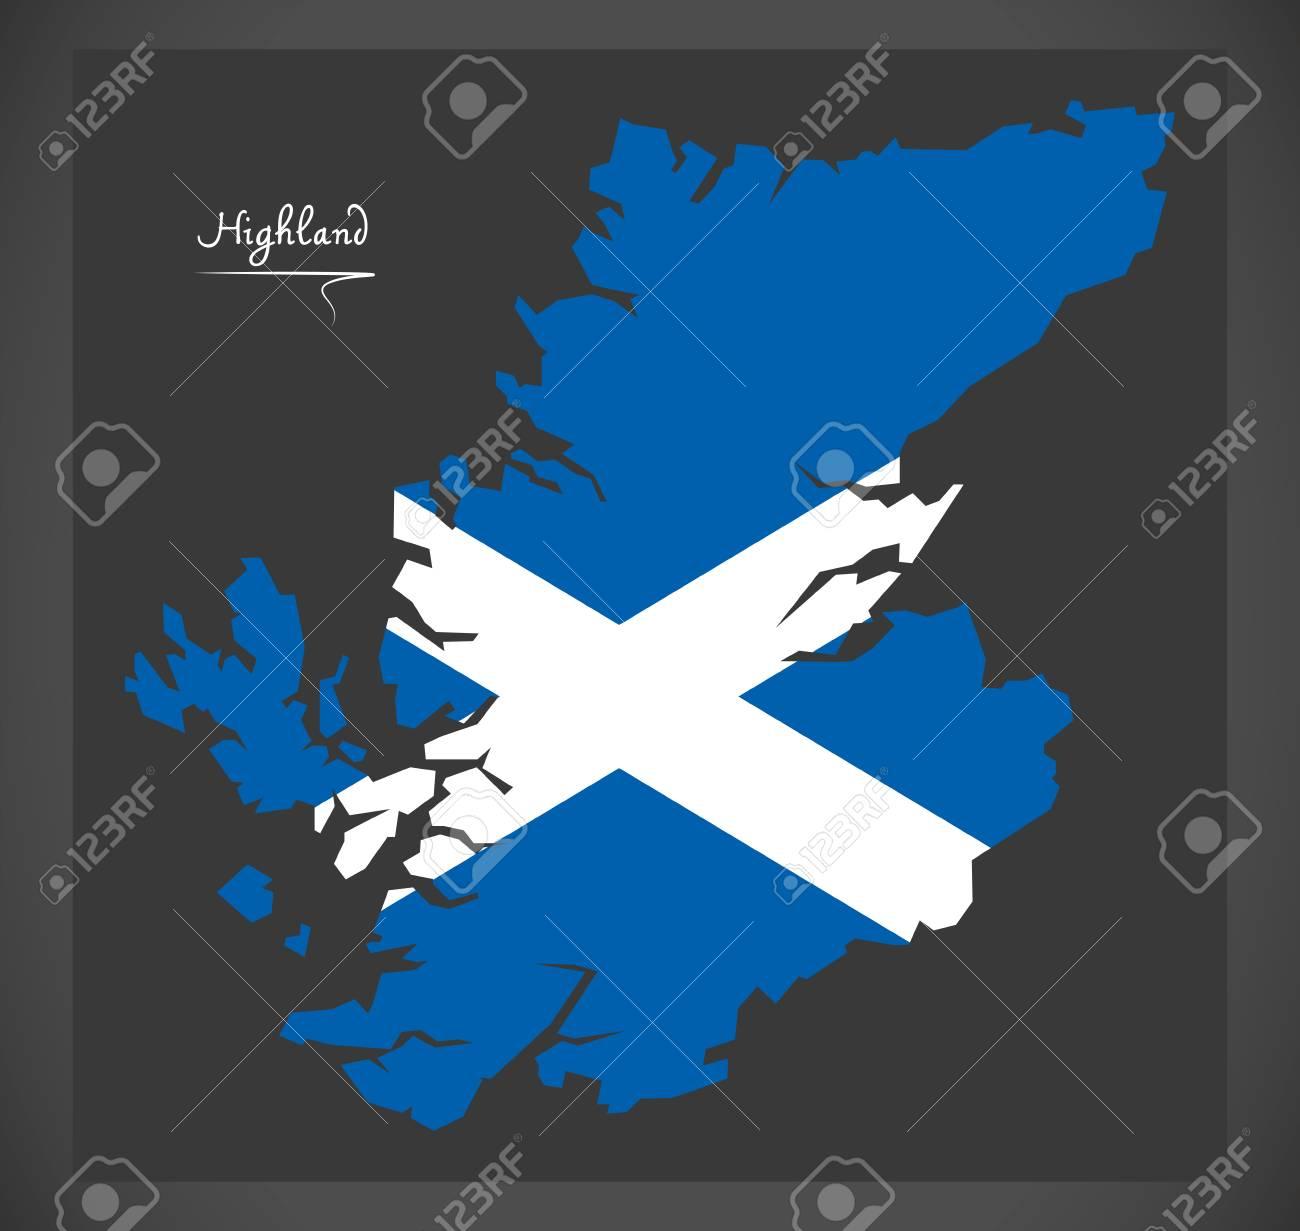 Highland of Scotland map with Scottish national flag illustration on scotland x france, scotland map outline, island of islay scotland map, scotland map google, scotland county map, scotland shortbread recipe, scotland beach, scotland name map, scotland community, scotland on map, scotland map large, scotland lion, scotland travel map, silhouette scotland map, scotland football map, scotland tattoo, scotland road map,